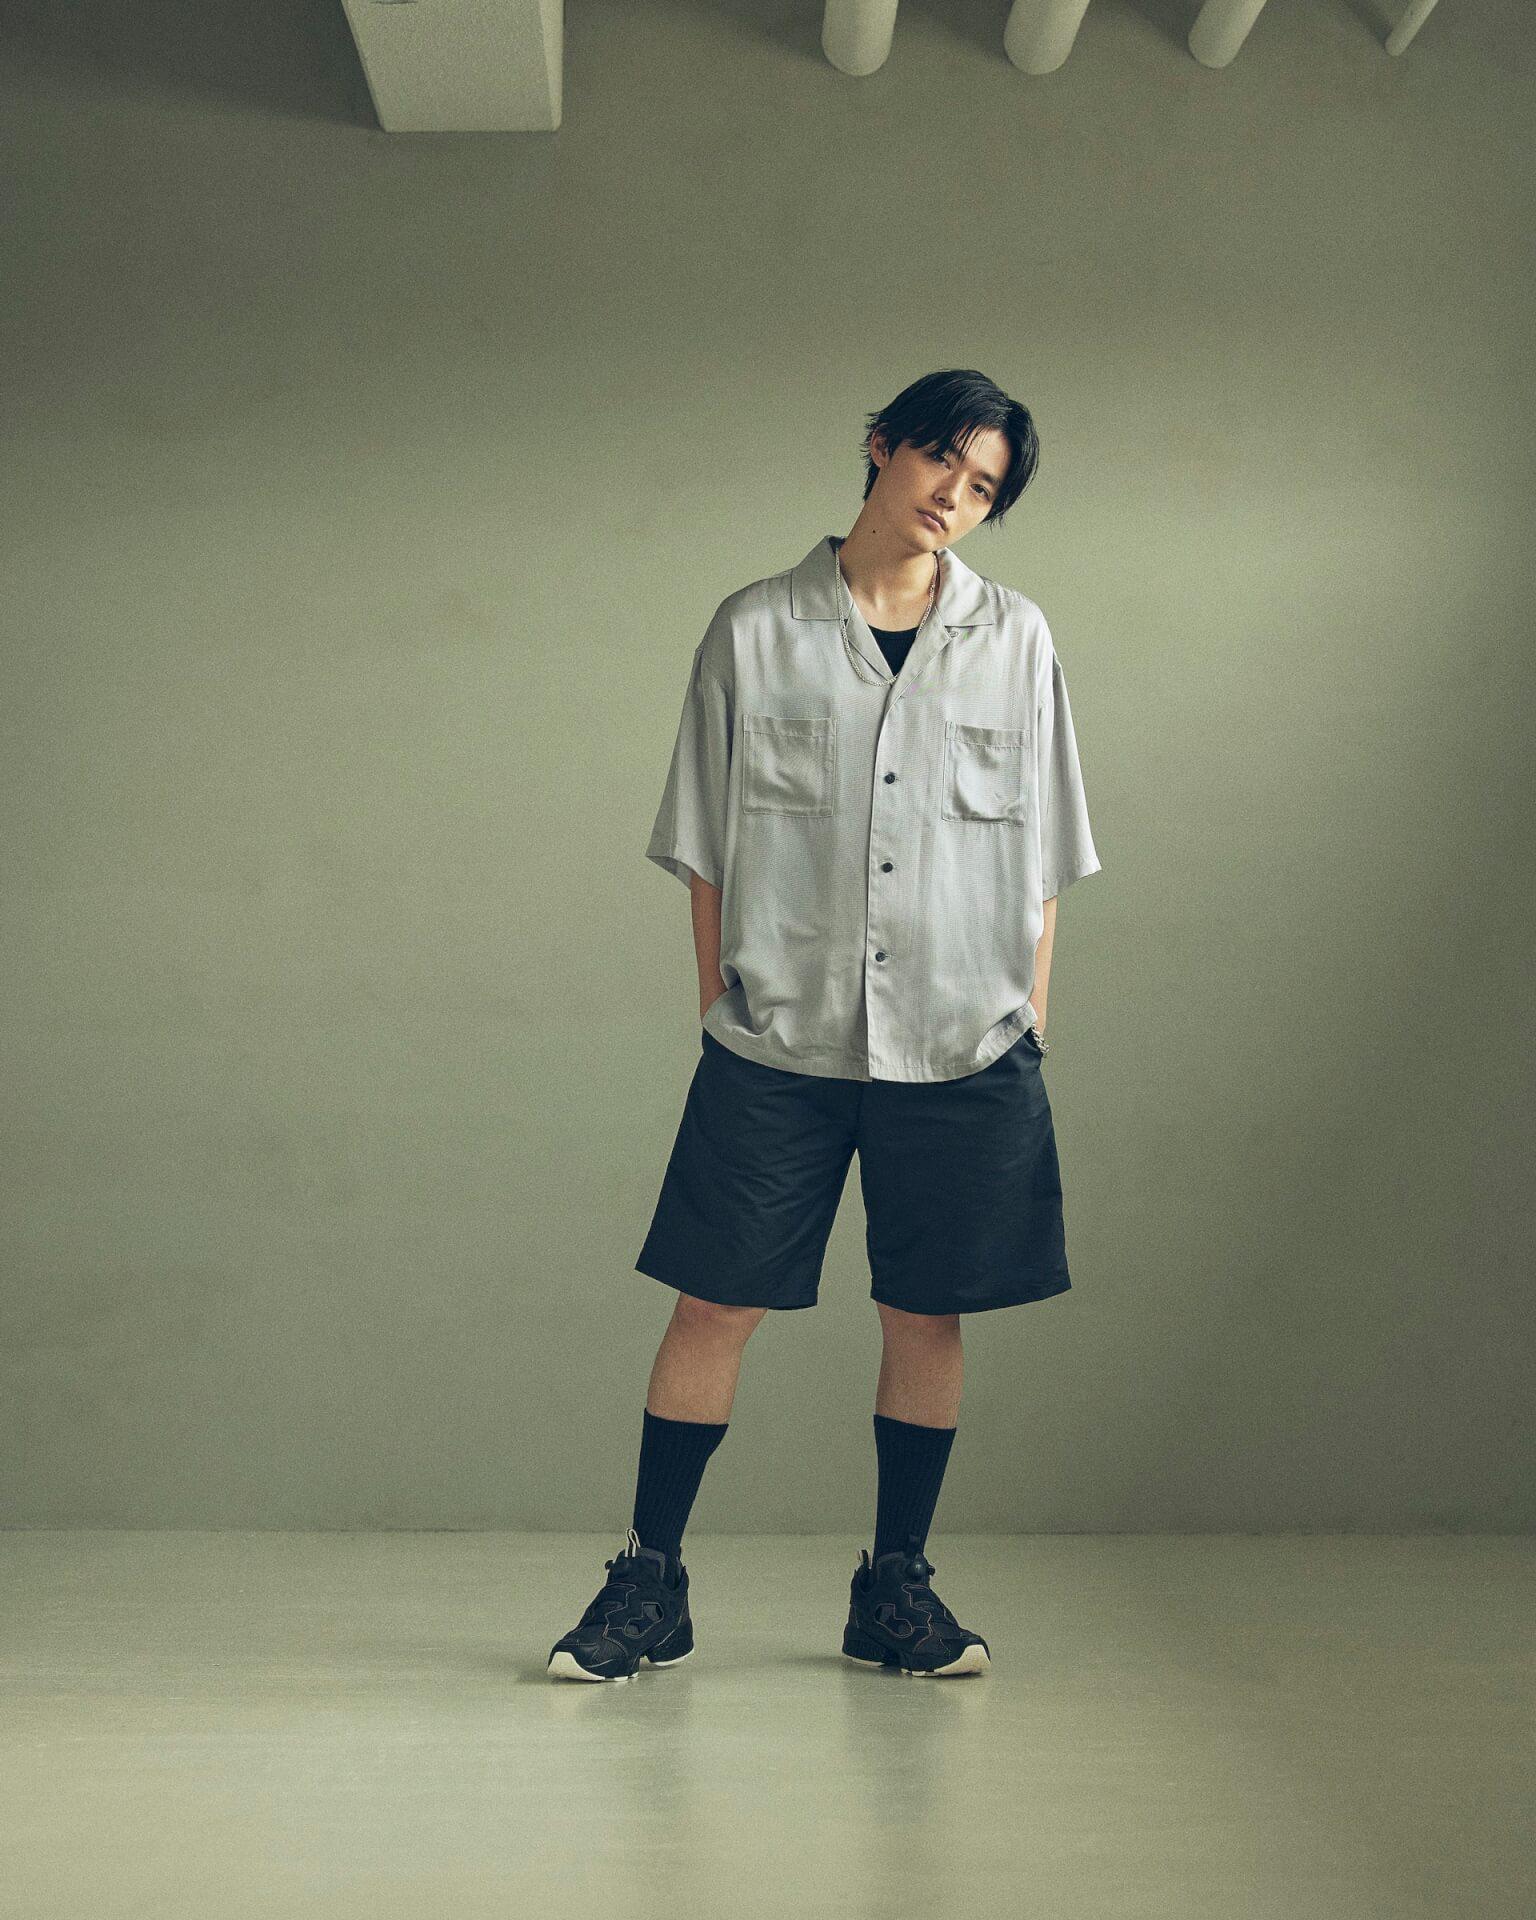 ReebokからリアルなデニムをイメージしたINSTAPUMP FURYの「DENIM PACK」が発売!櫻井海音とアンジュルム佐々木莉佳子がルックに登場 Fashion_210719_denimpack12